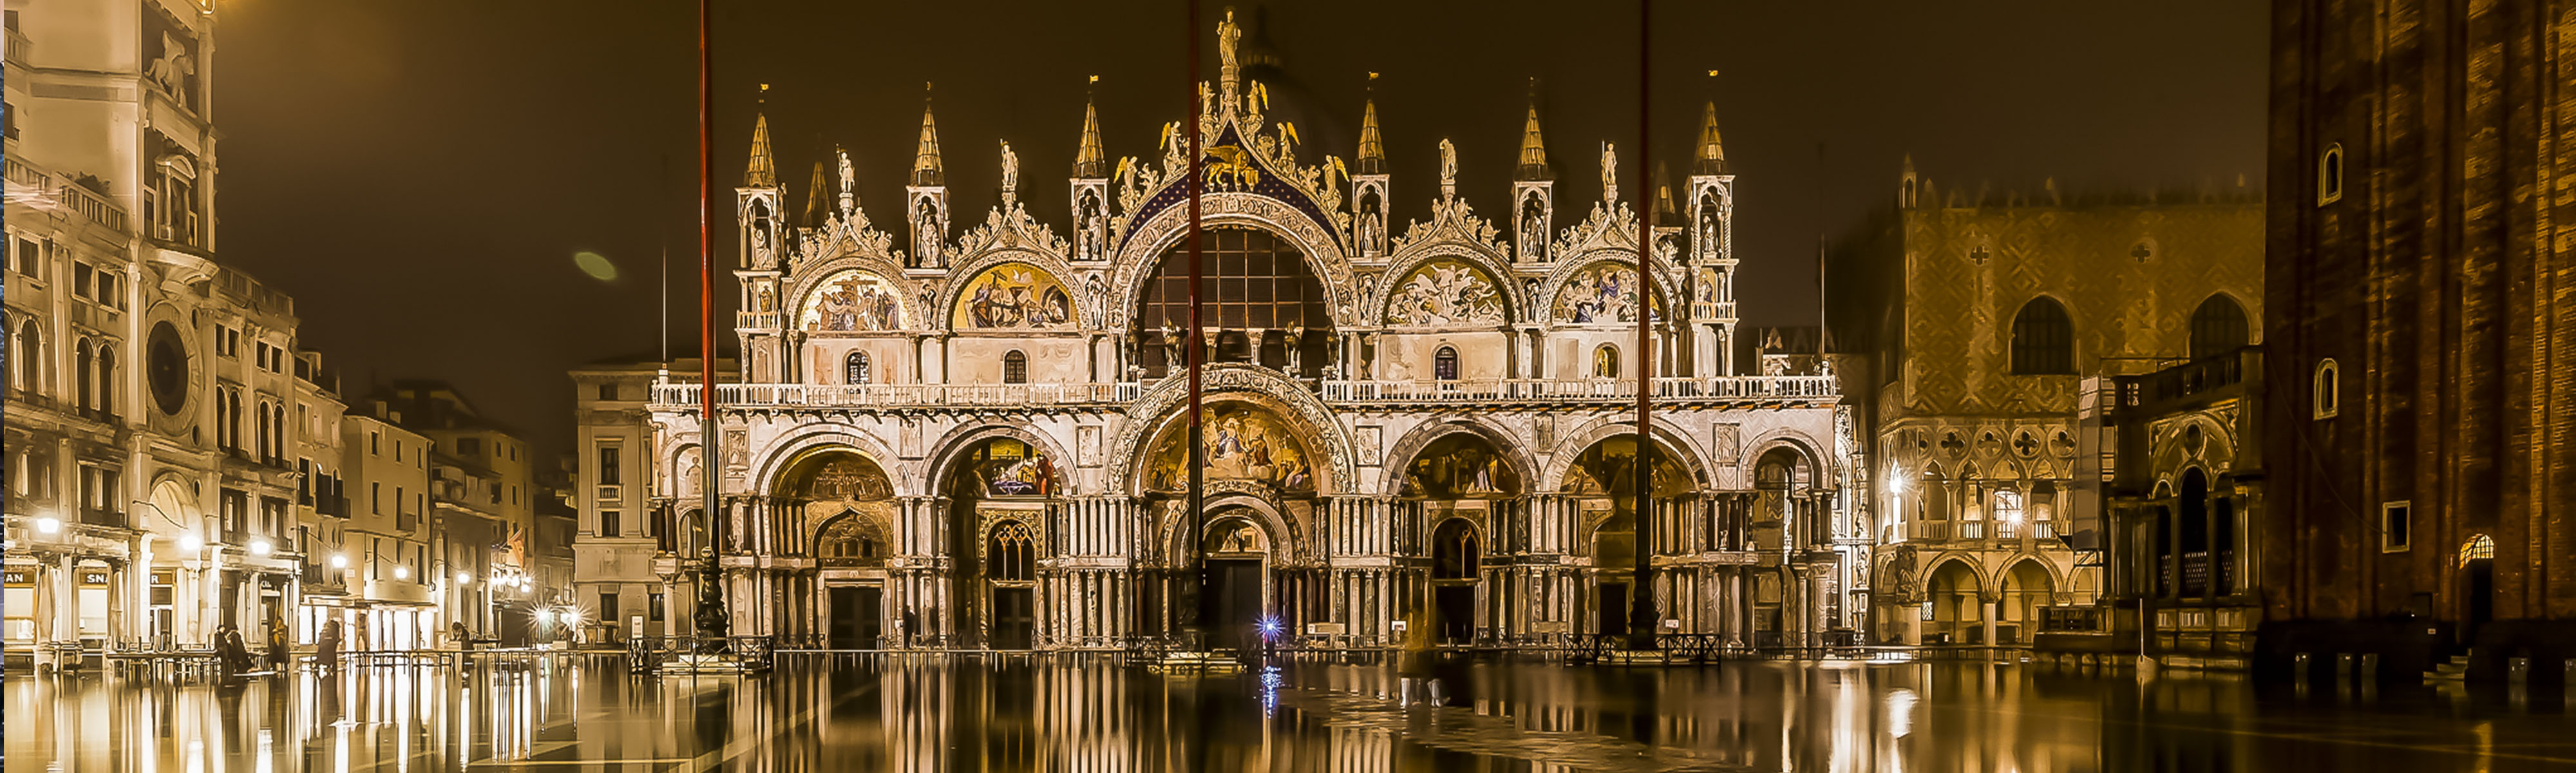 Sliderbild Venedig